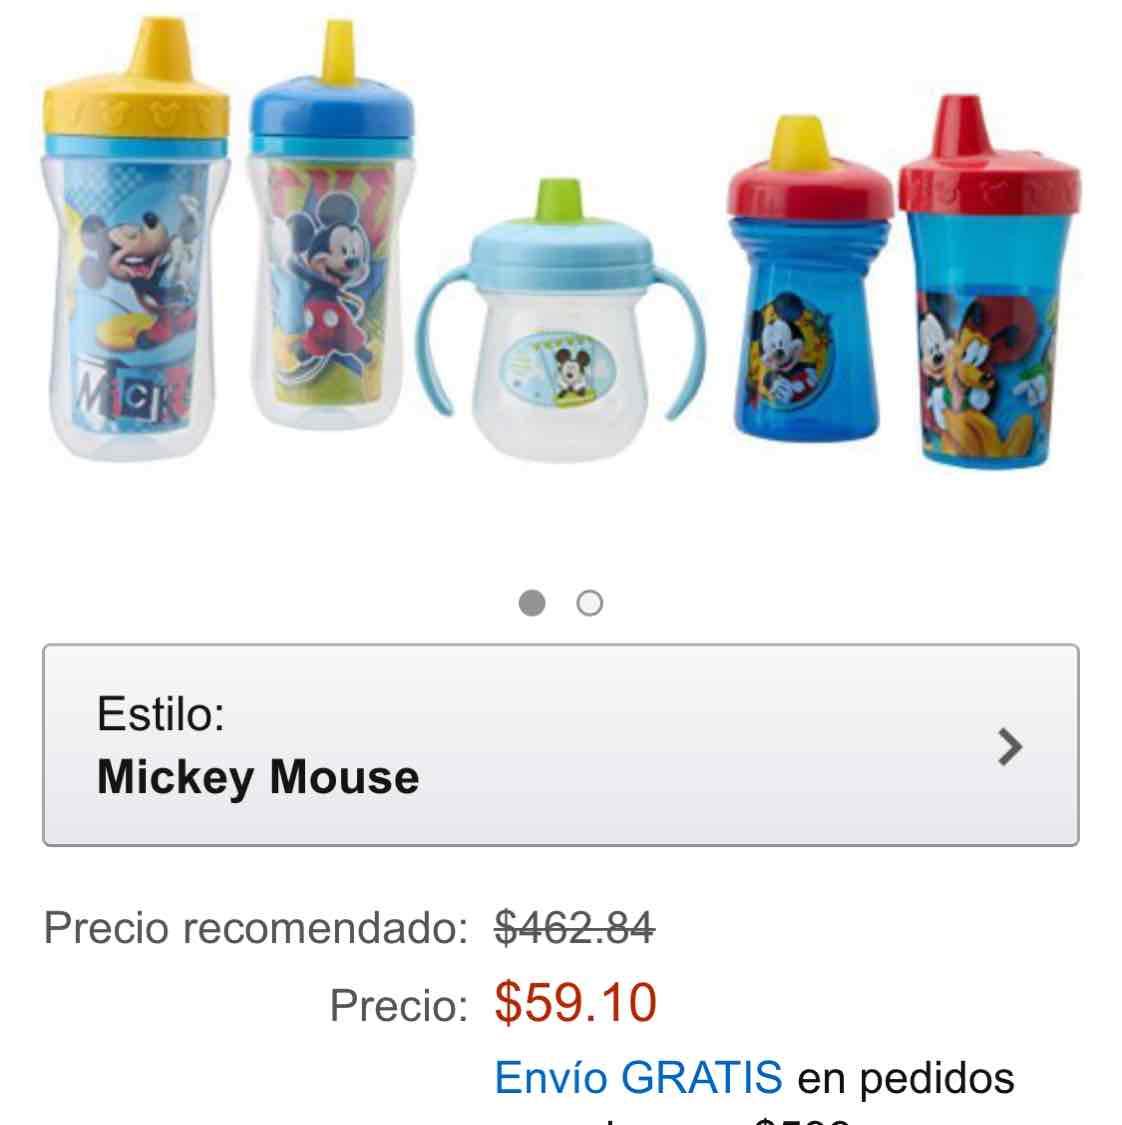 Amazon: The First Years Paqetp MCY Paquete Mickey de Vasos Entrenadores por Etapas, 5 Piezas, azul